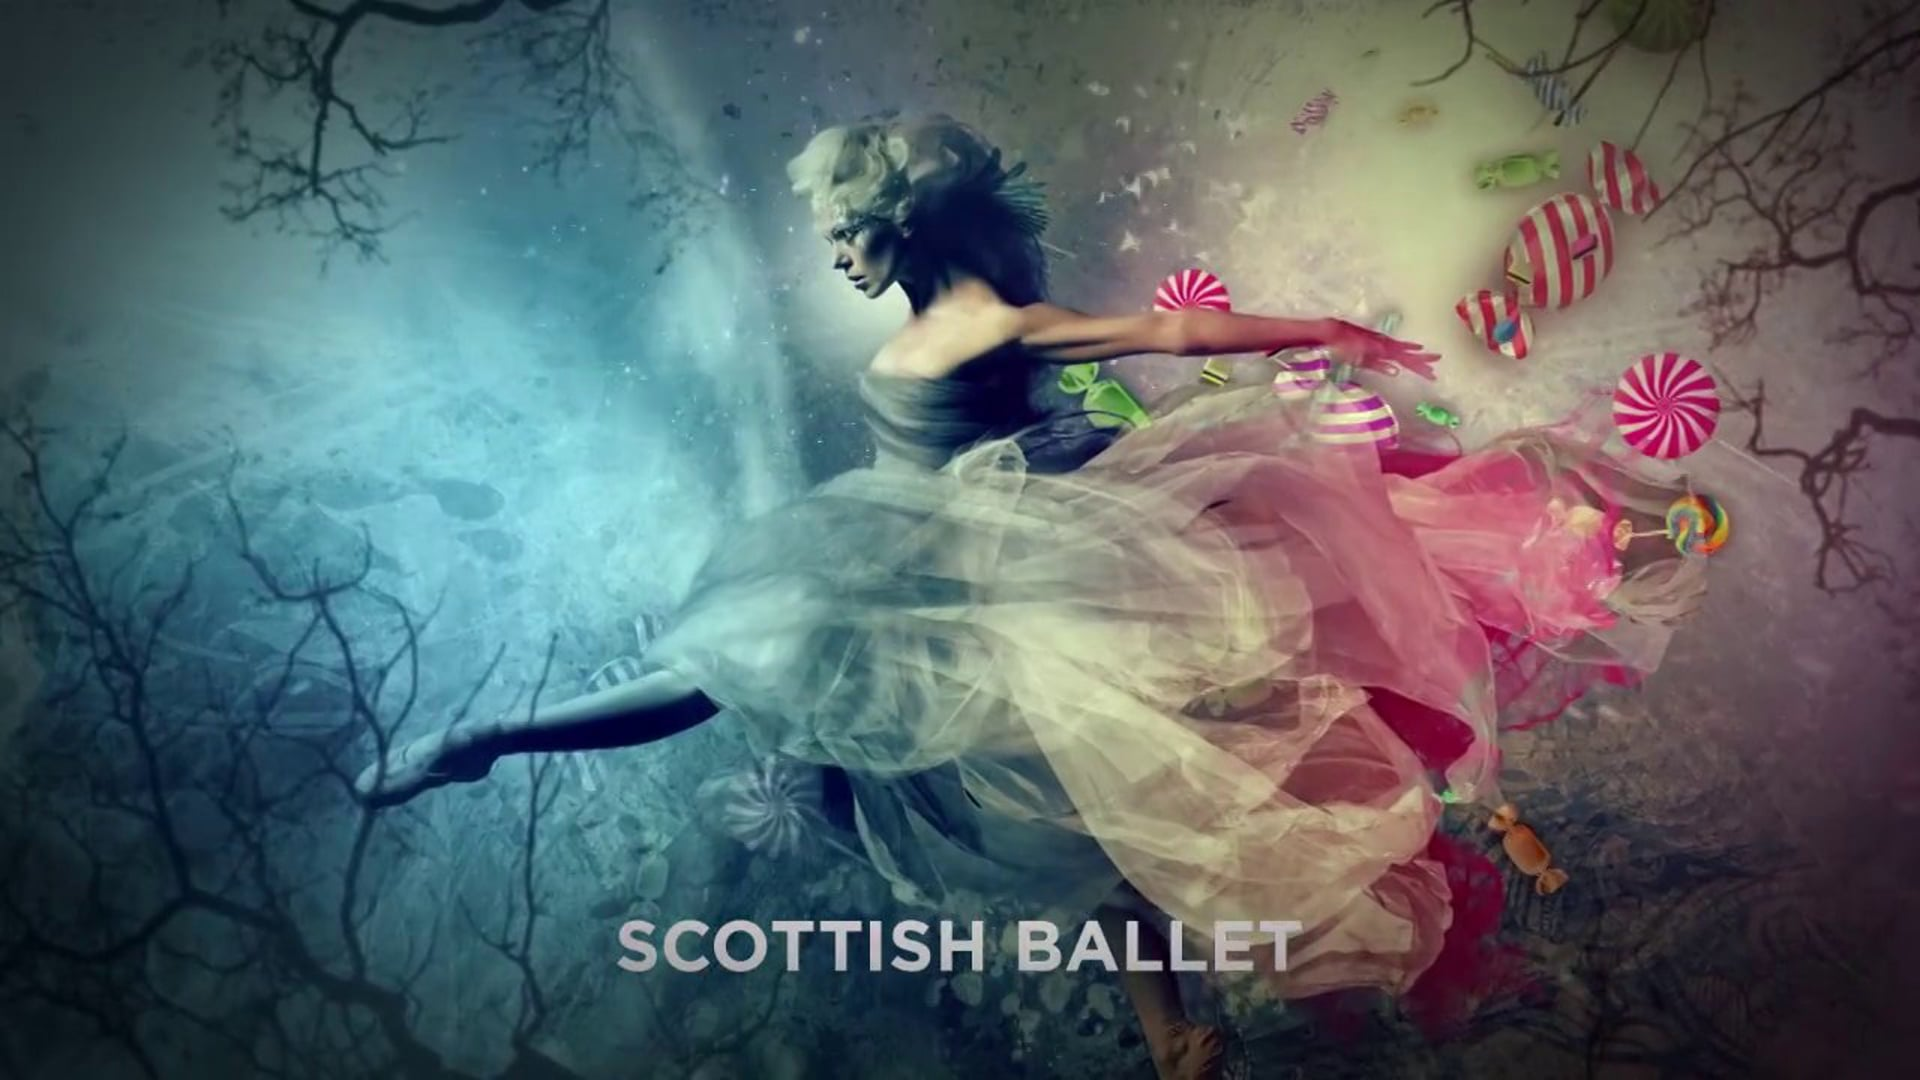 Scottish Ballet TVC - Edinburgh